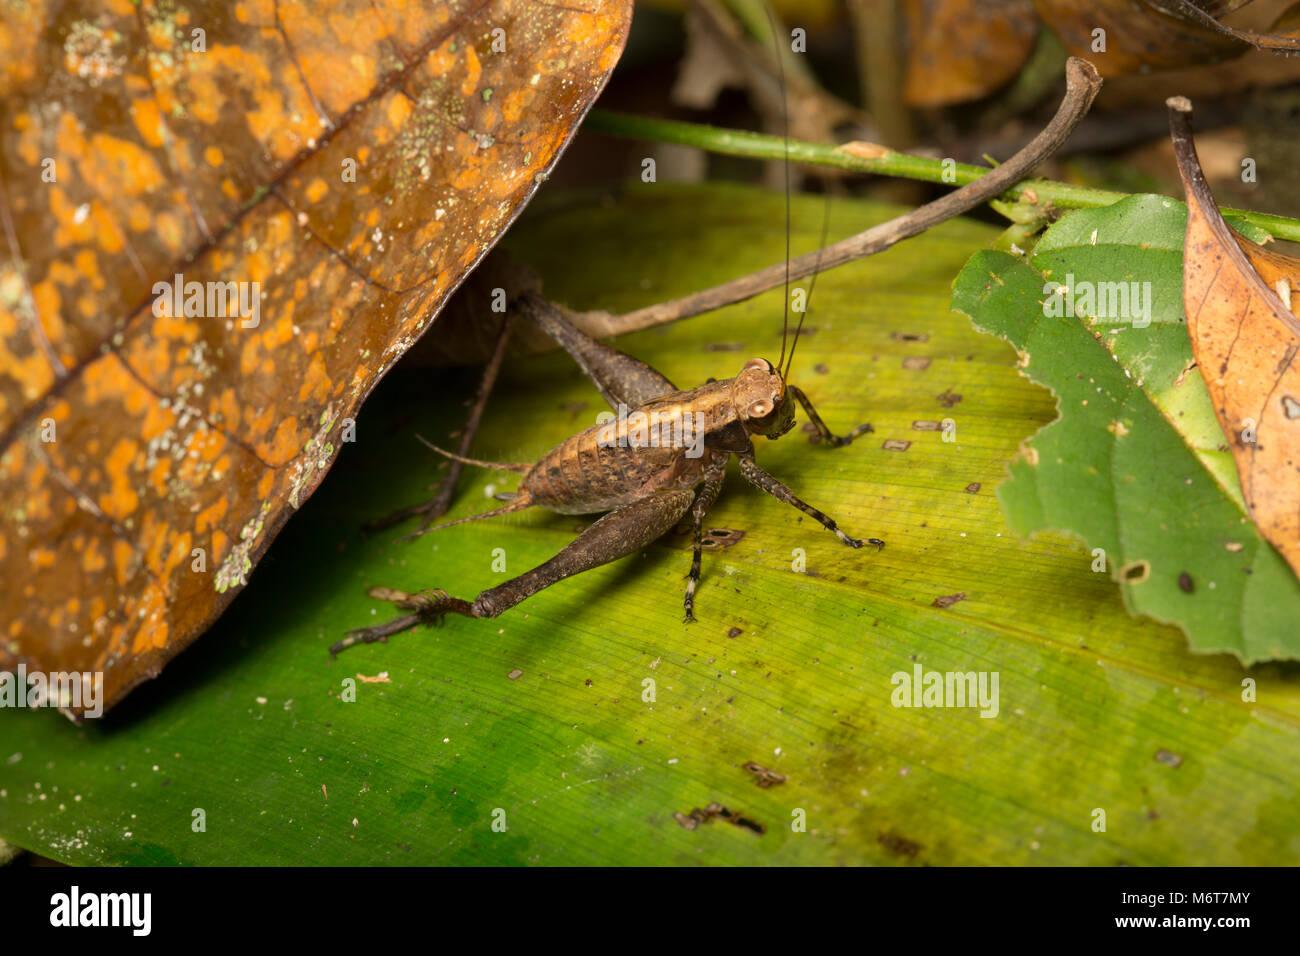 Bush cricket or katydid, Suriname, South America - Stock Image